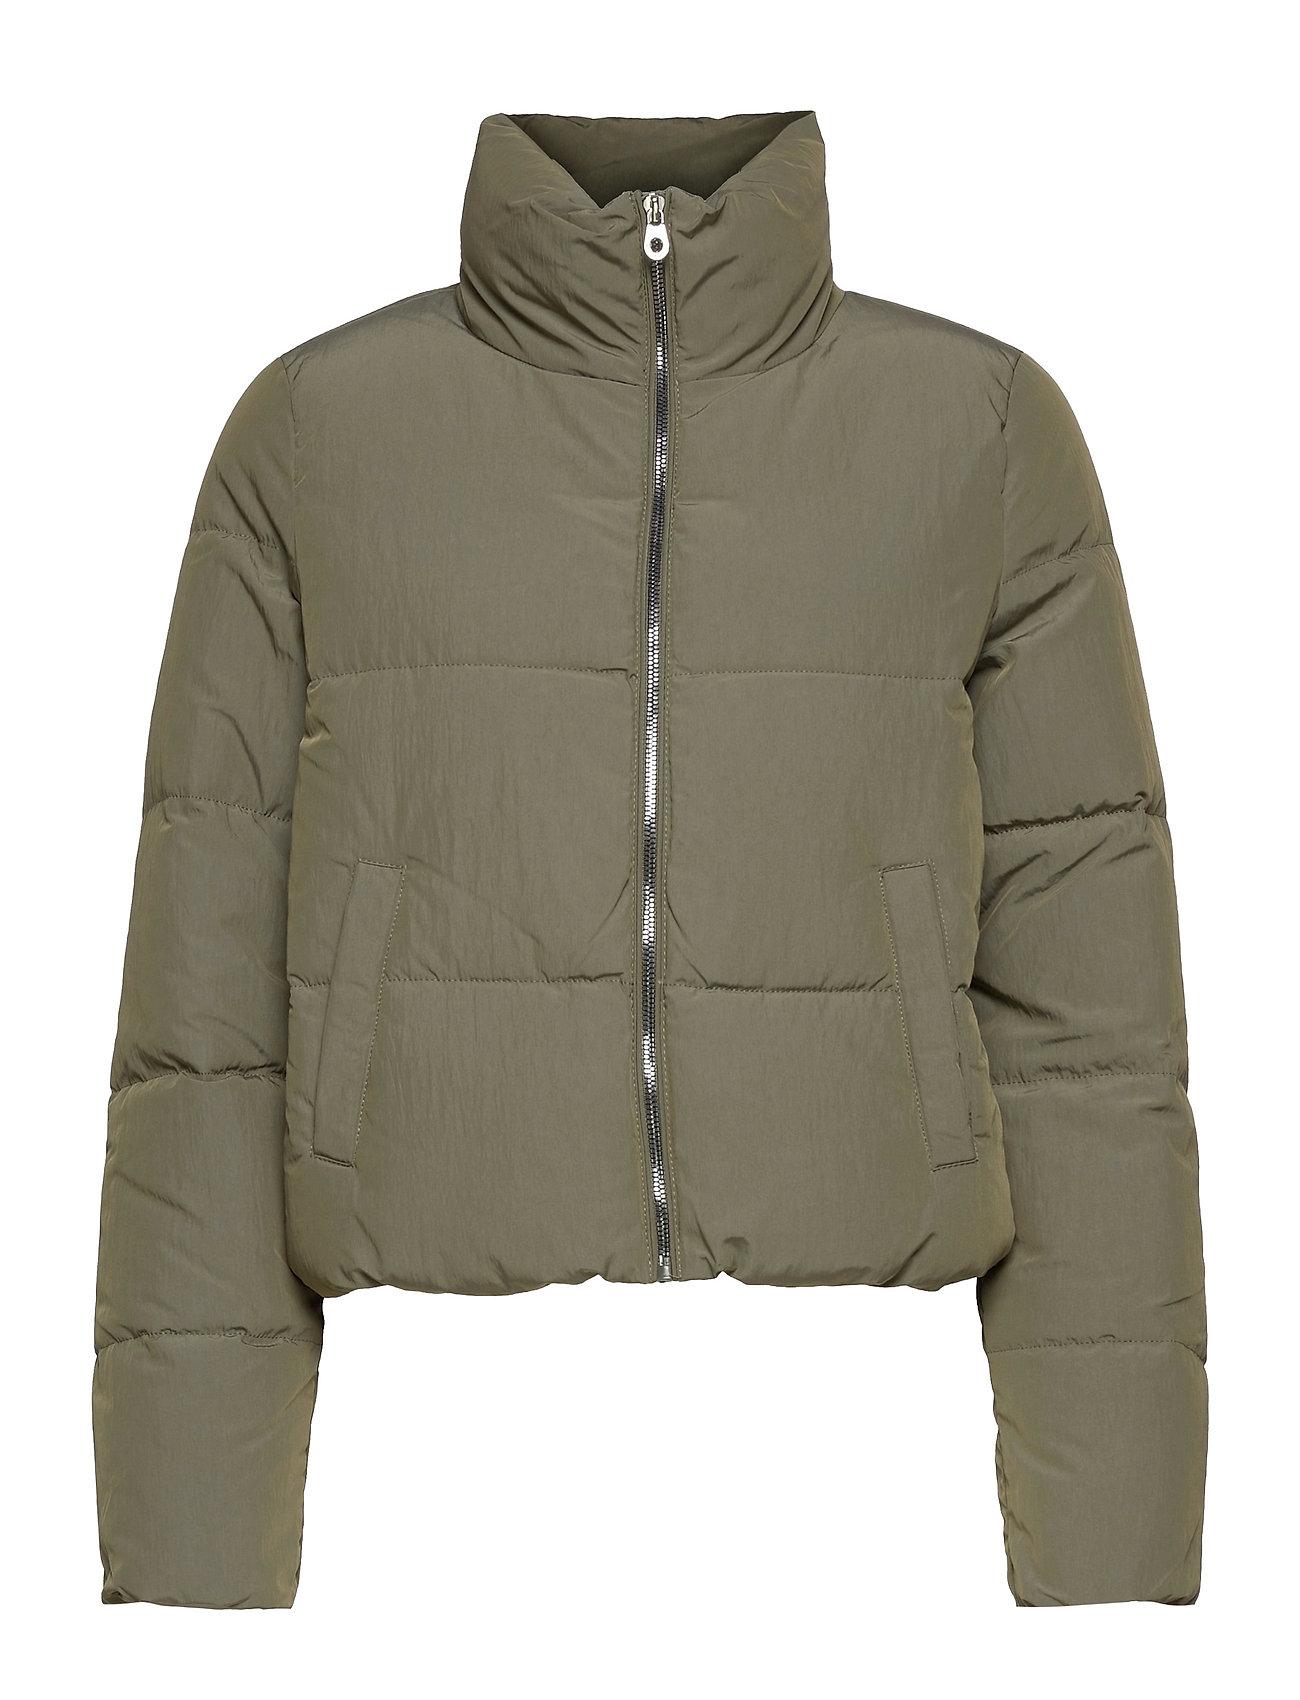 Onldolly Short Puffer Jacket Otw Noos Foret Jakke Grøn ONLY